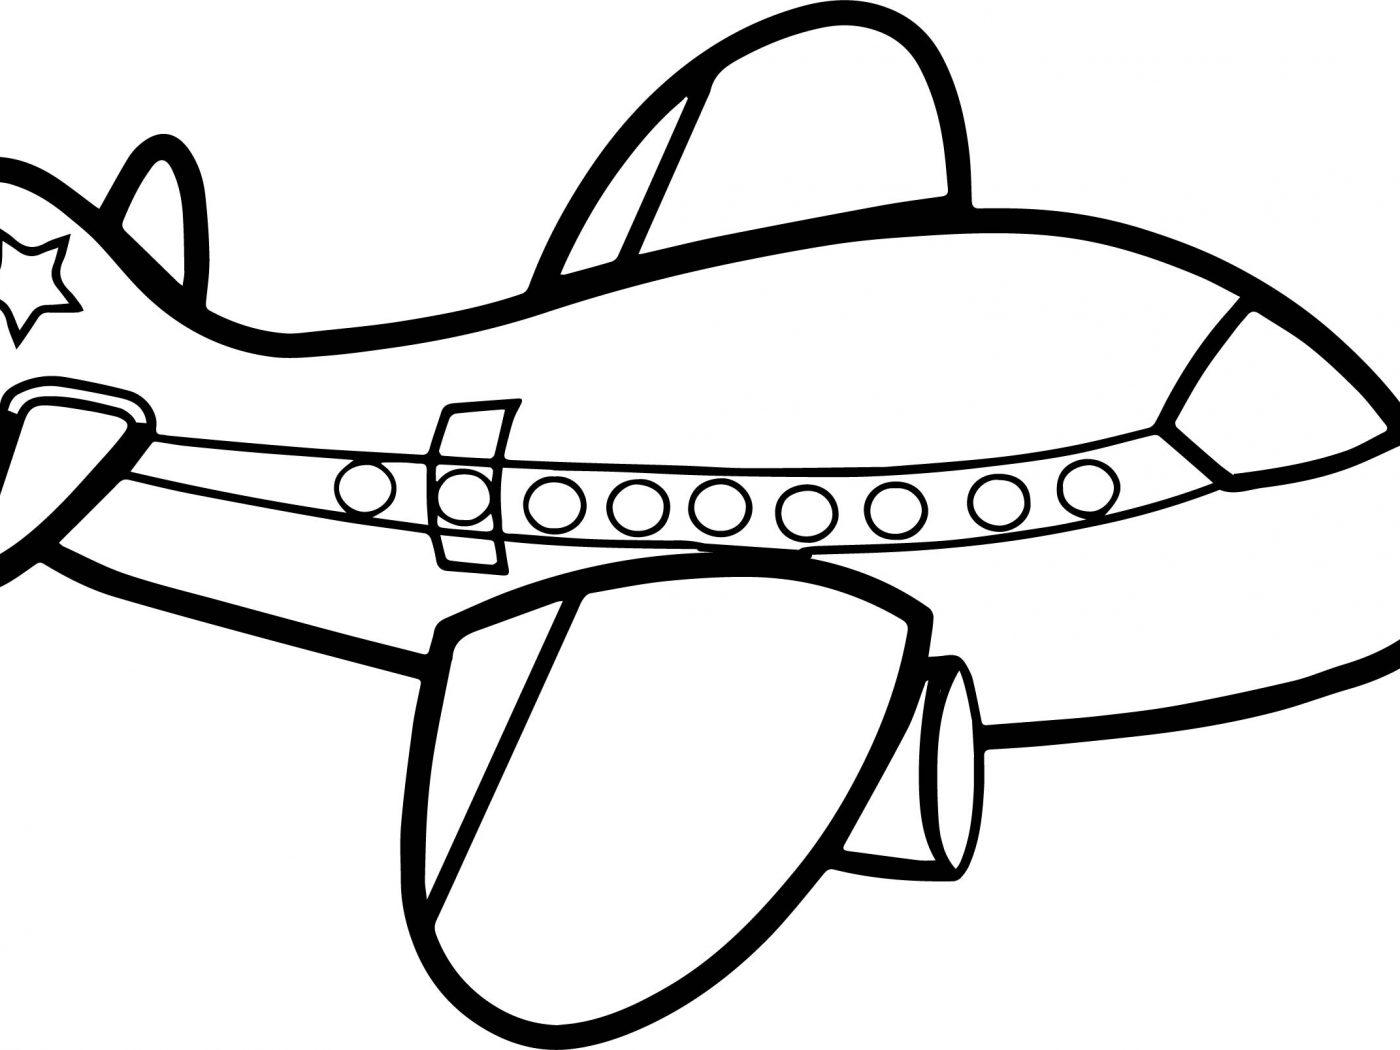 Airplane Drawing At Getdrawings